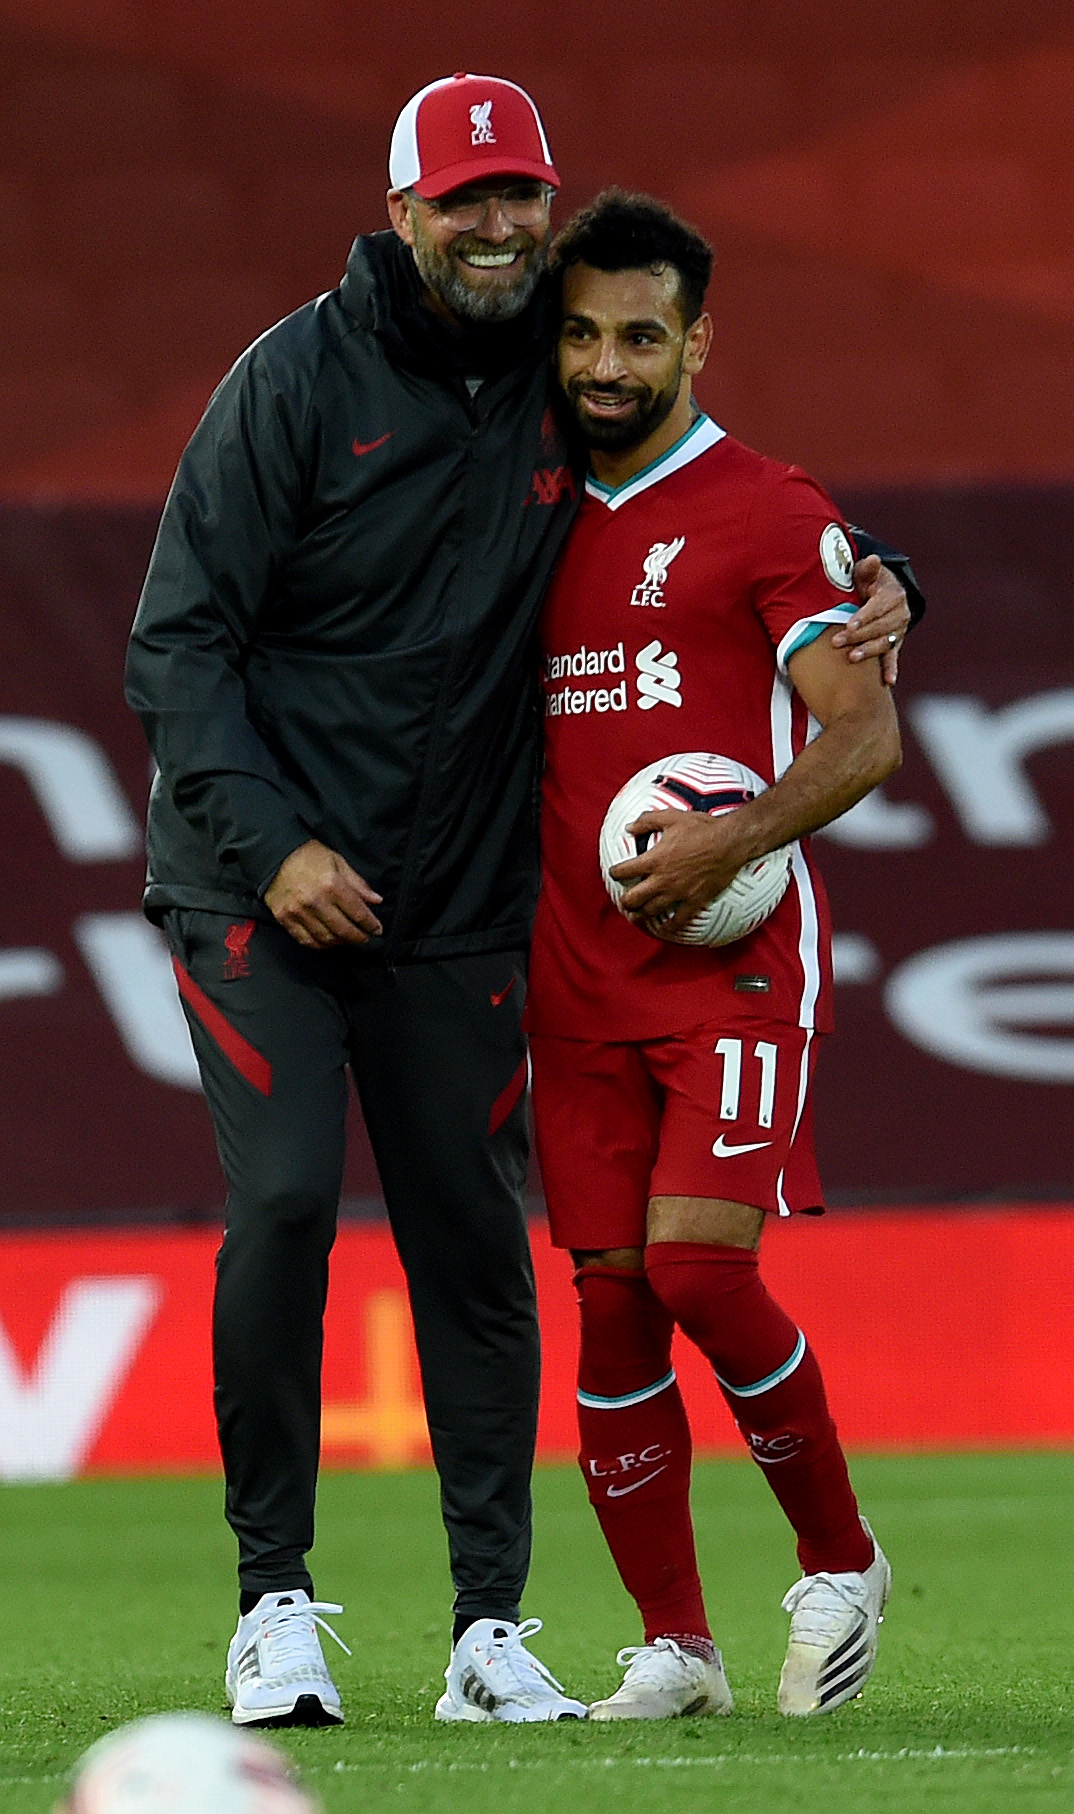 Jurgen Klopp with Mohamed Salah - Liverpool - Premier League